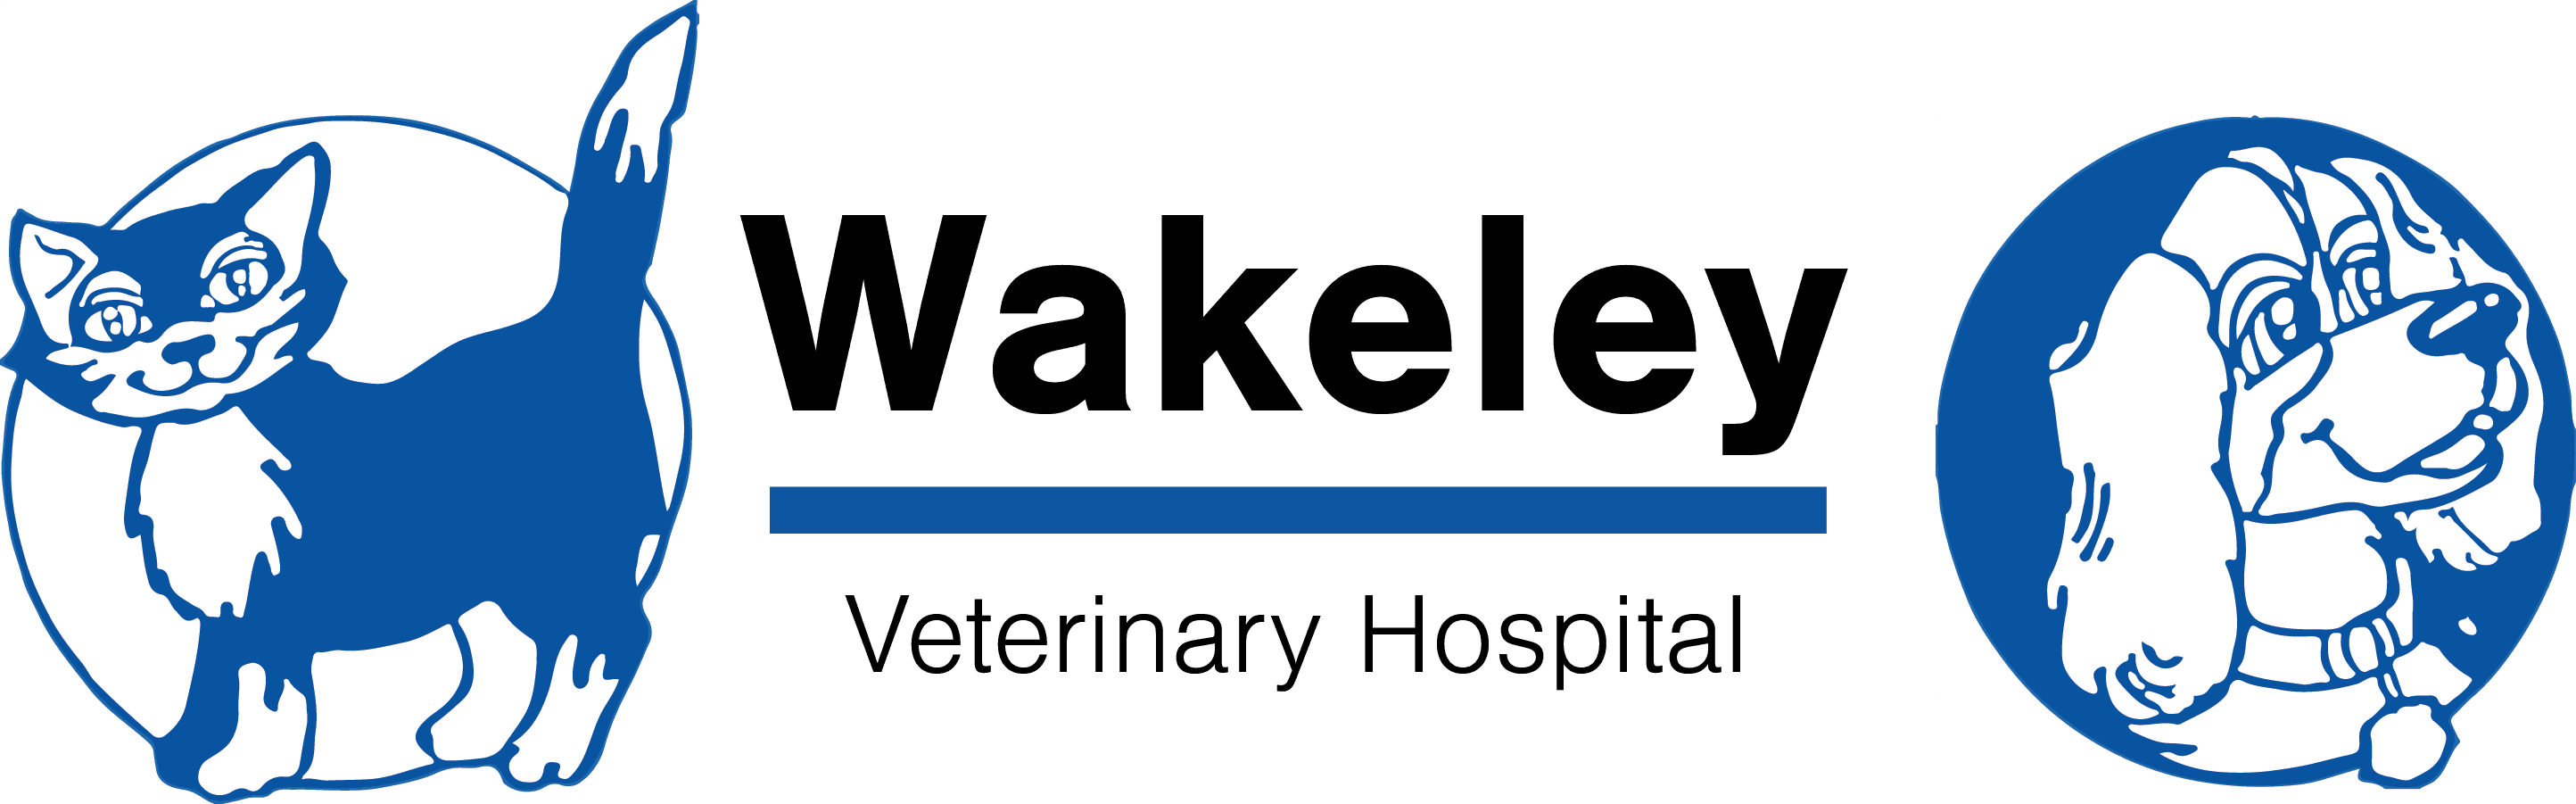 Veterinarian in Wakeley | Wakeley Veterinary Hospital